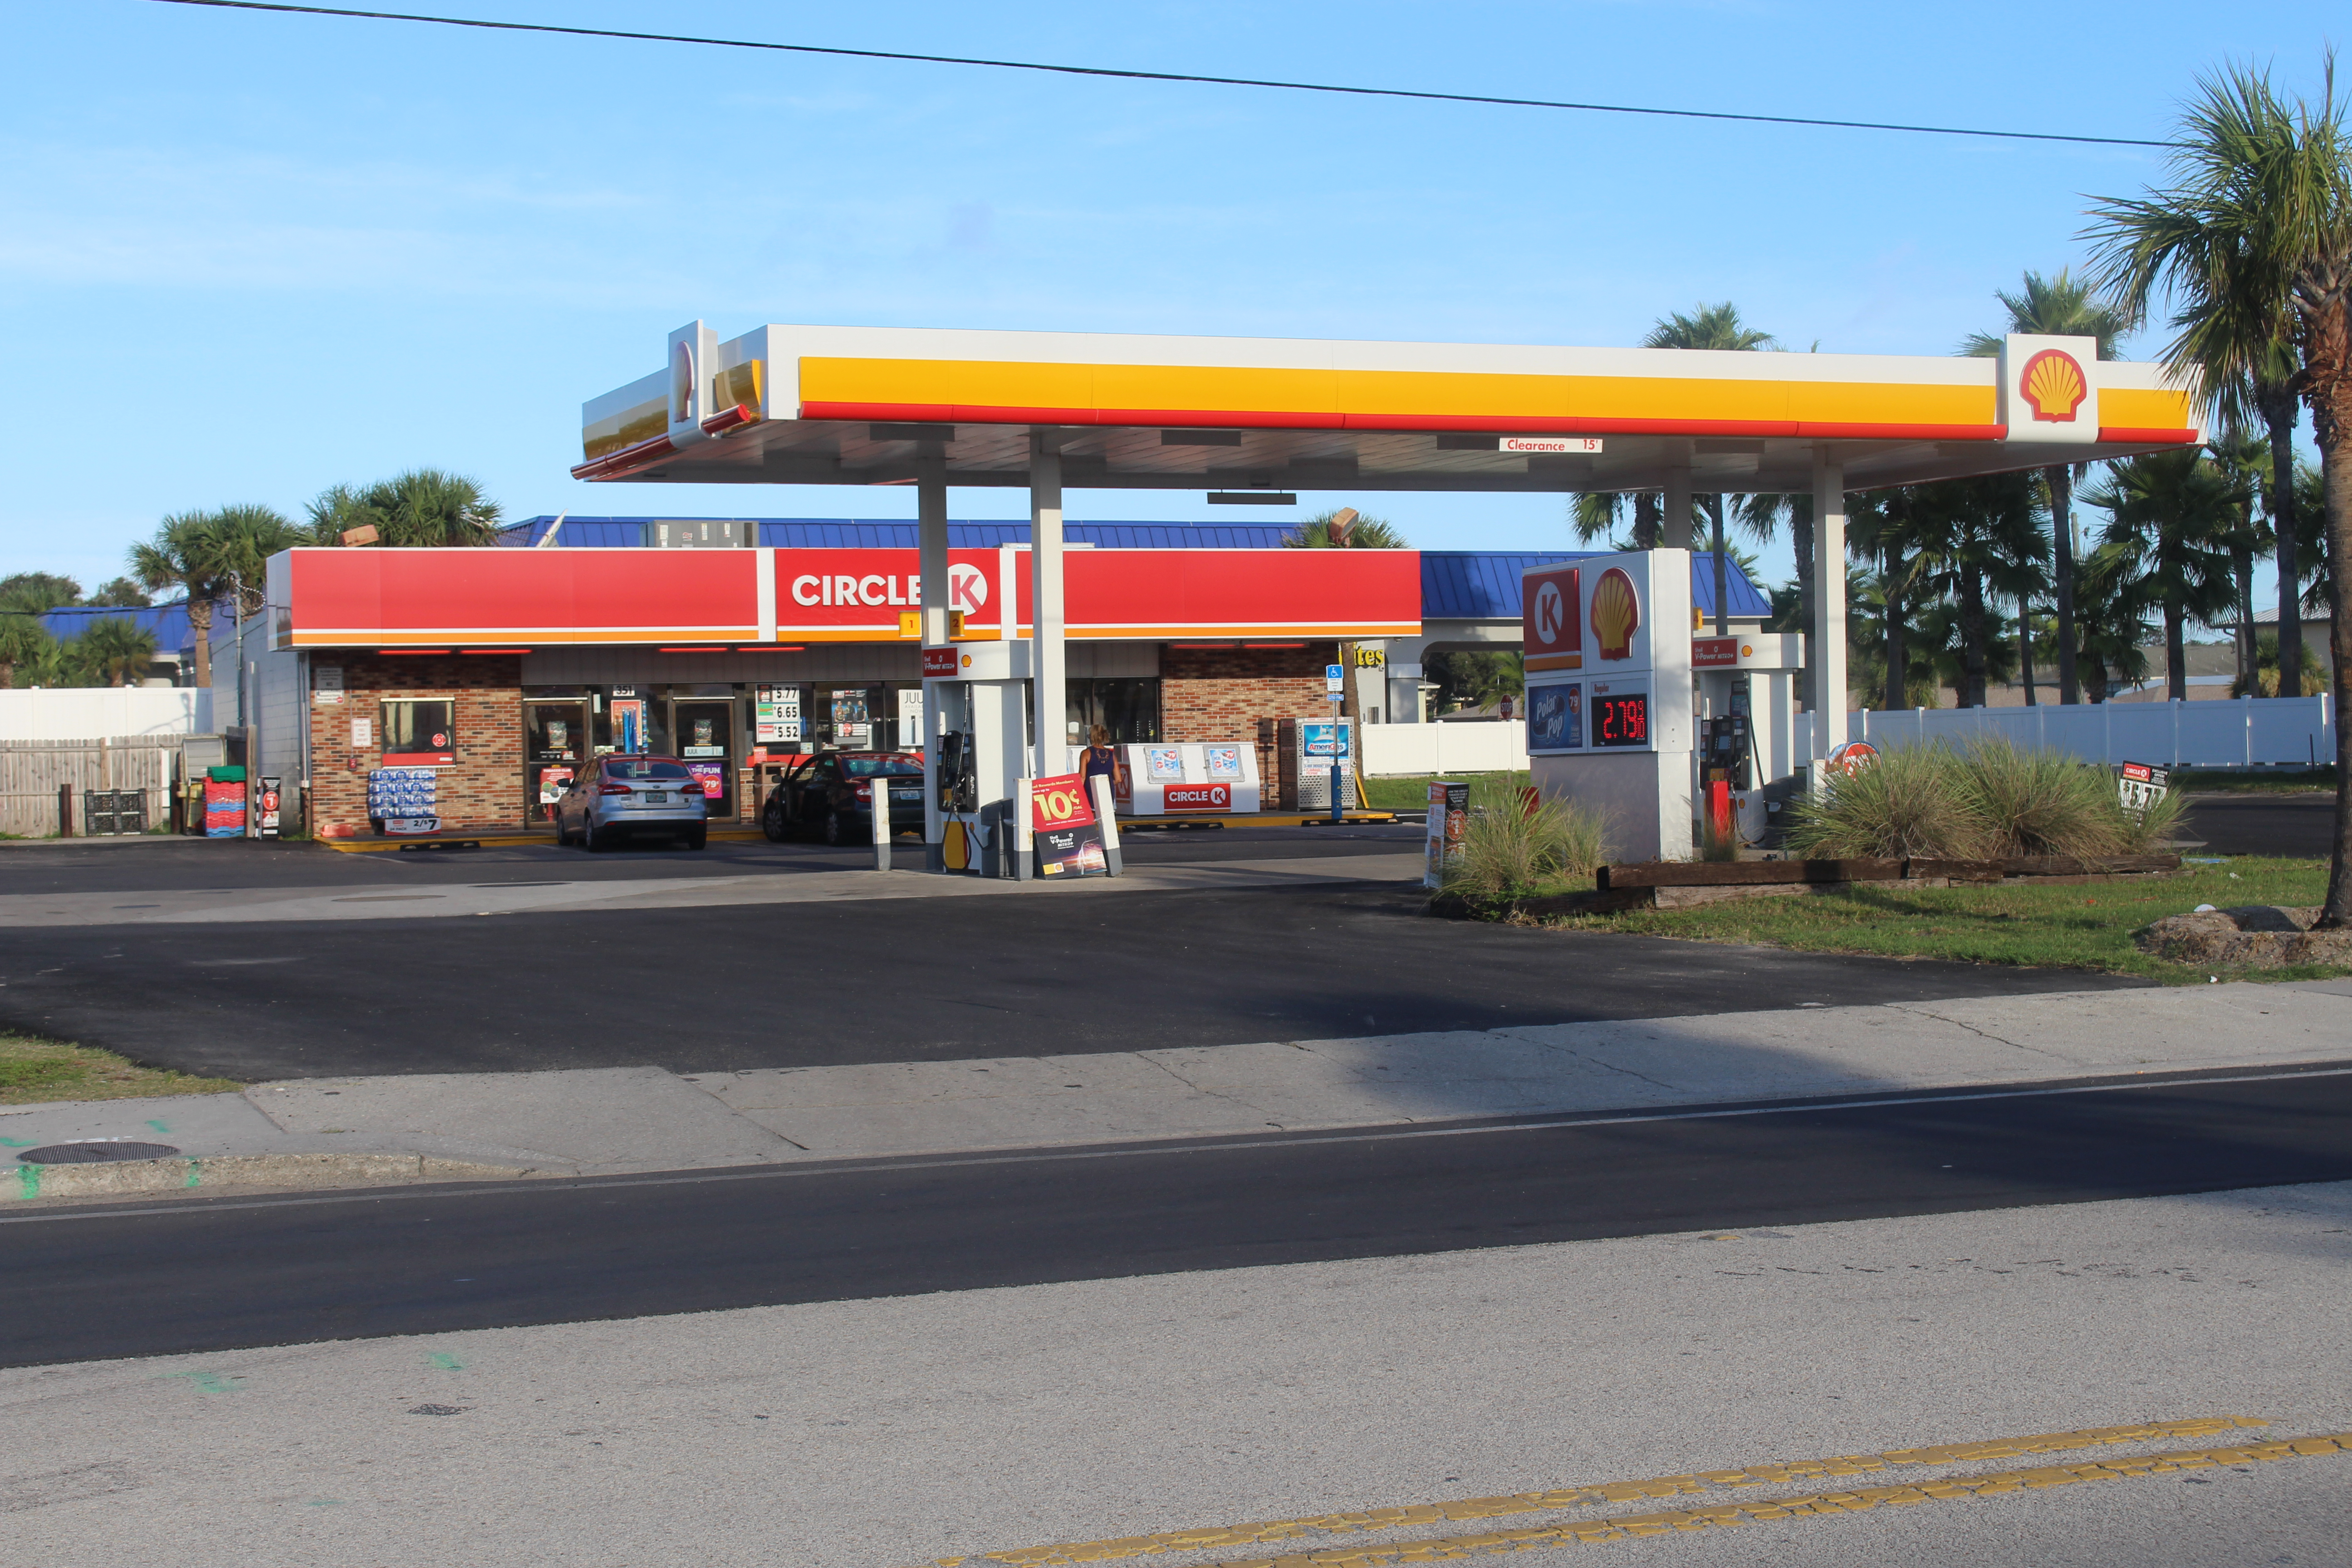 File:Circle K, Shell gas station St  Augustine Beach jpg - Wikimedia